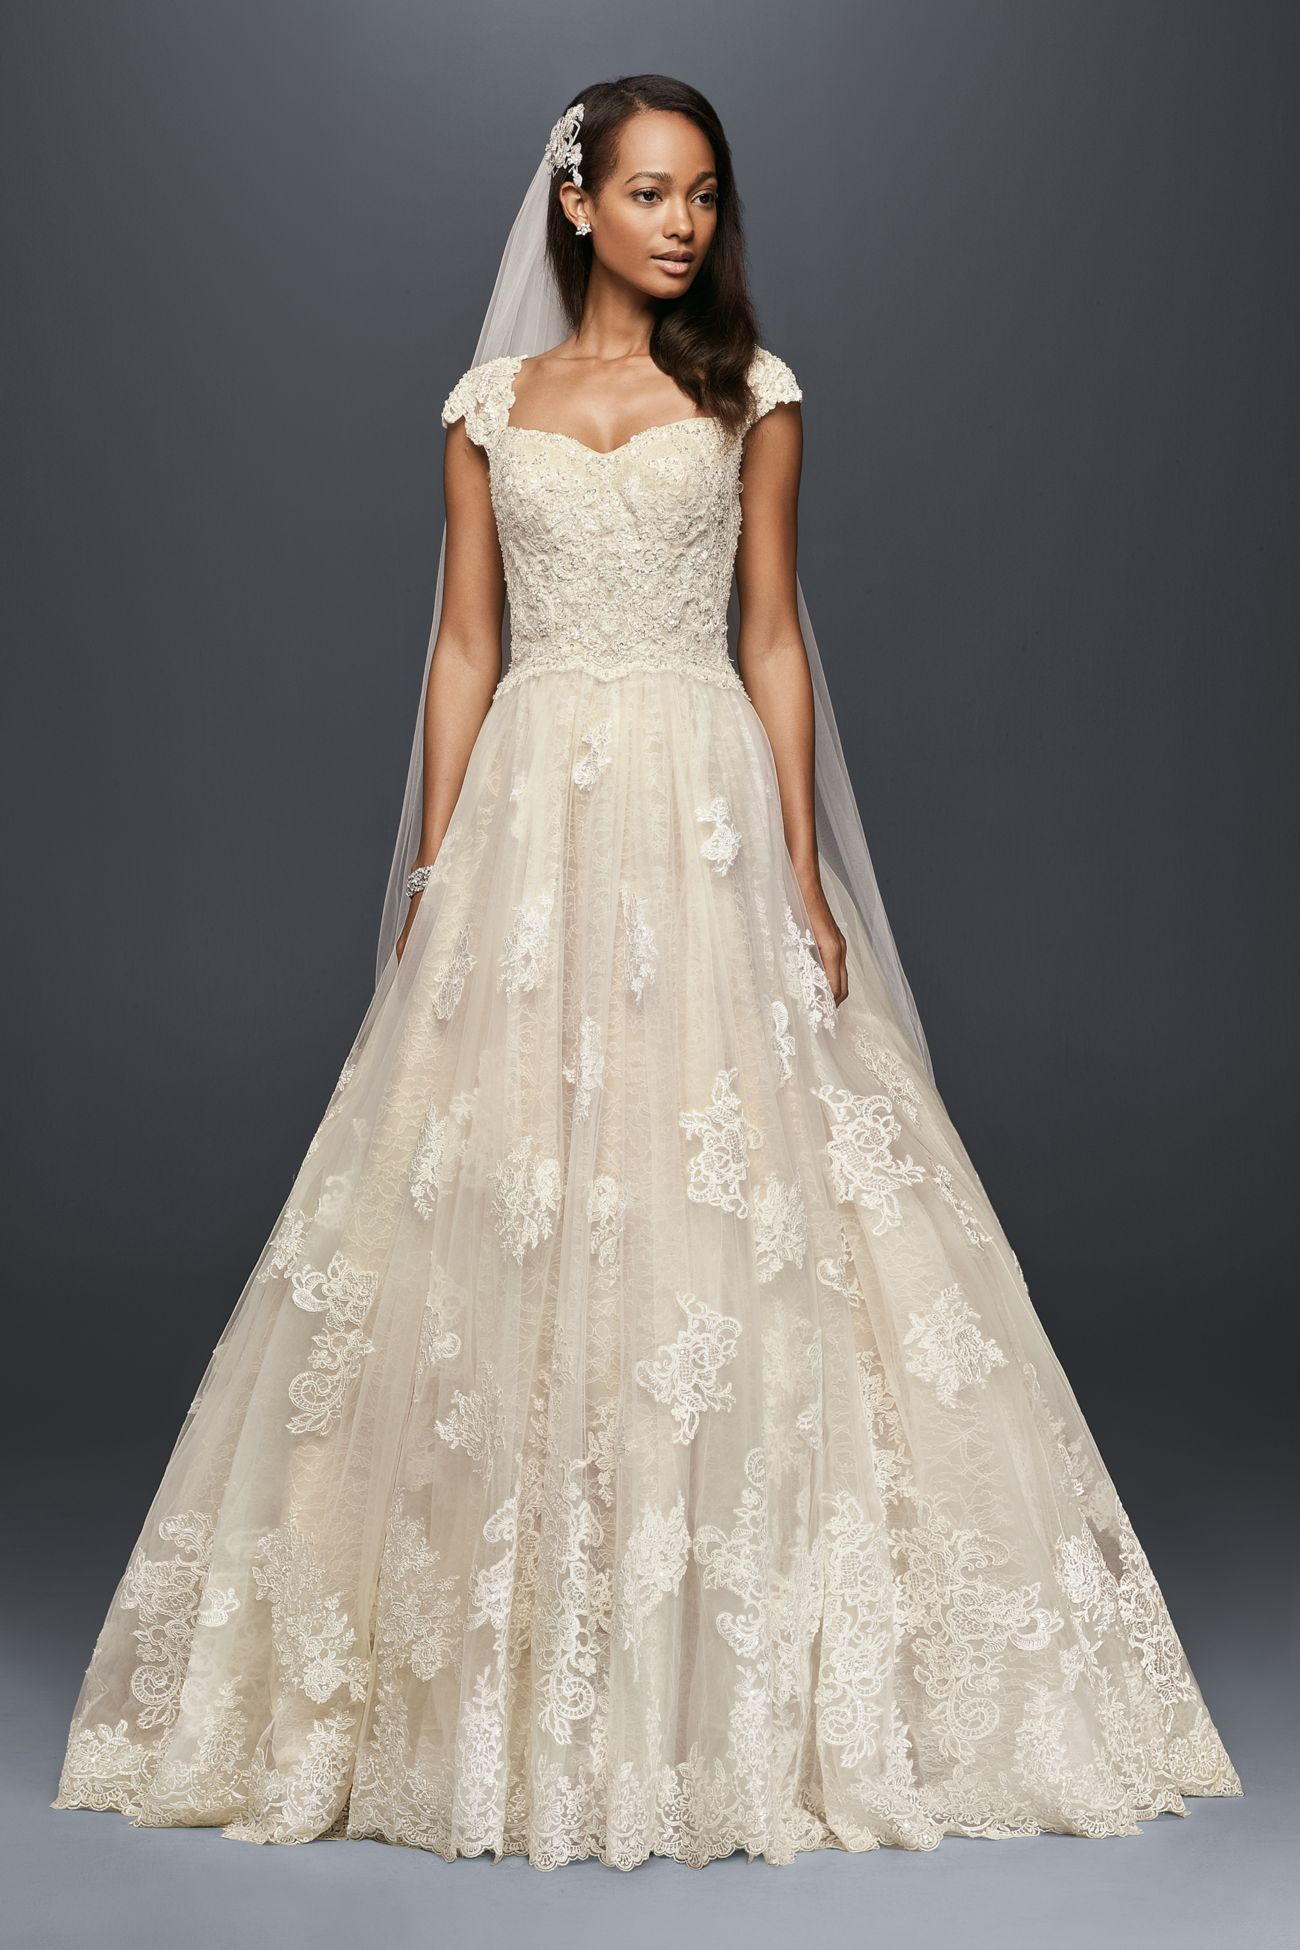 Cap Sleeve Lace Wedding Ball Gown With Beading David S Bridal Davids Bridal Wedding Dresses Wedding Dress Cap Sleeves Ball Gown Wedding Dress